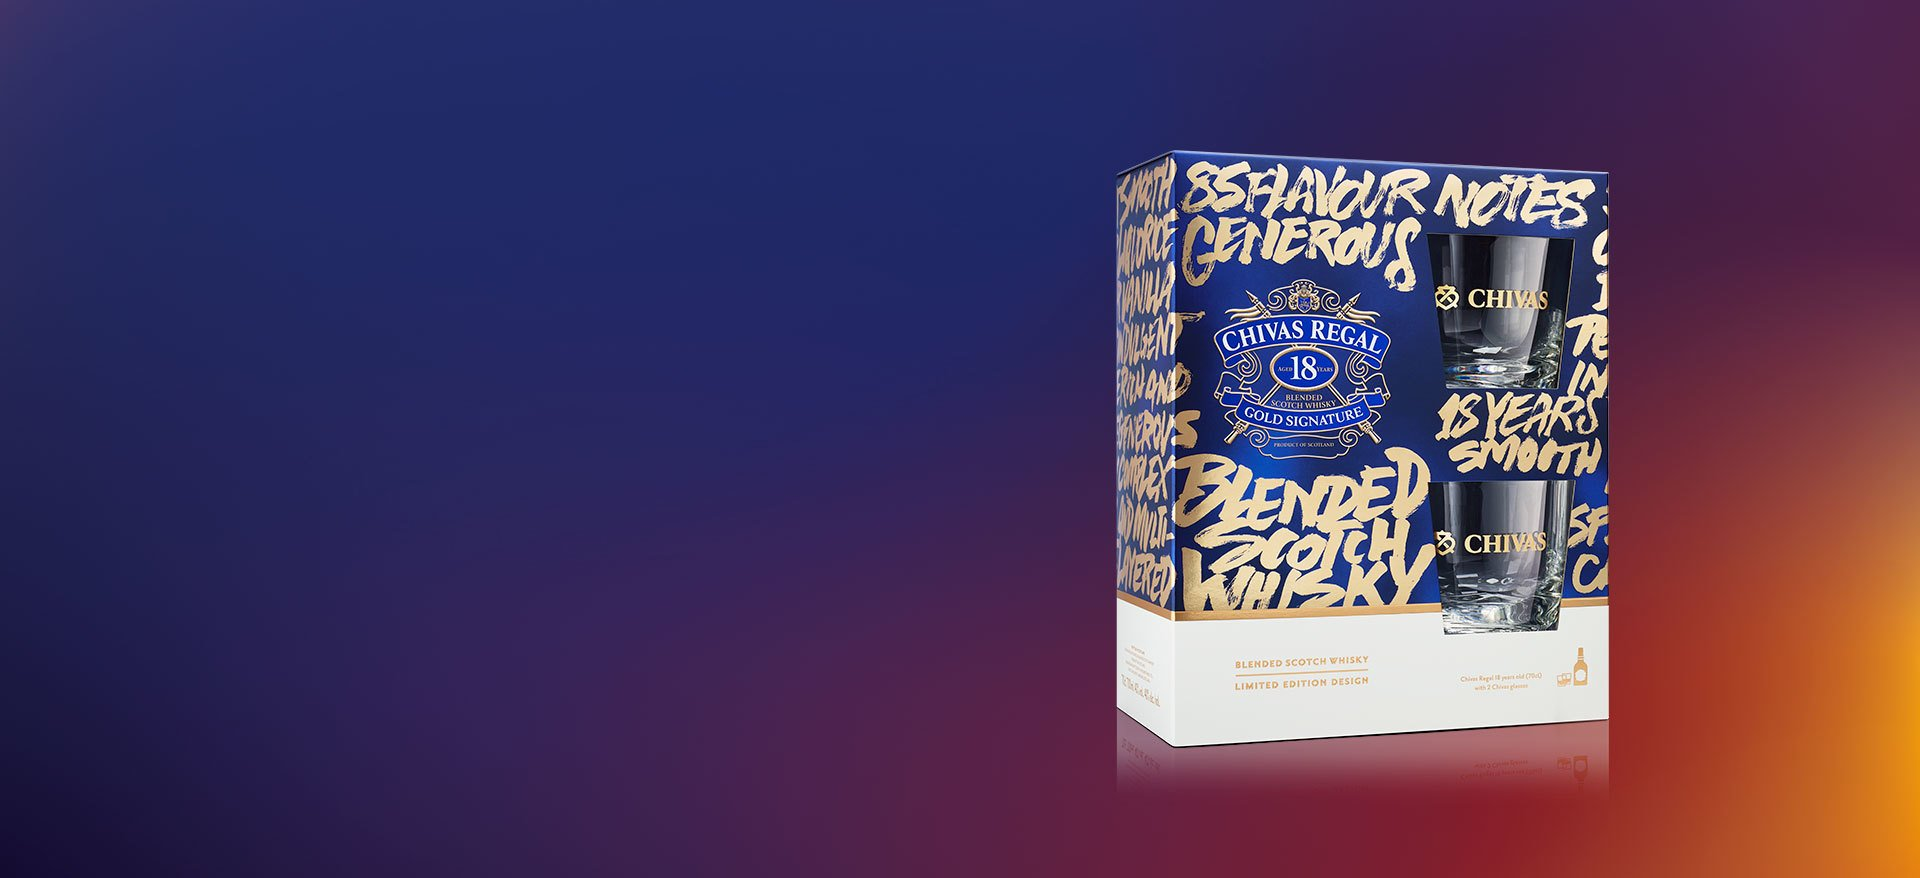 Chivas Regal Limited Edition Gift